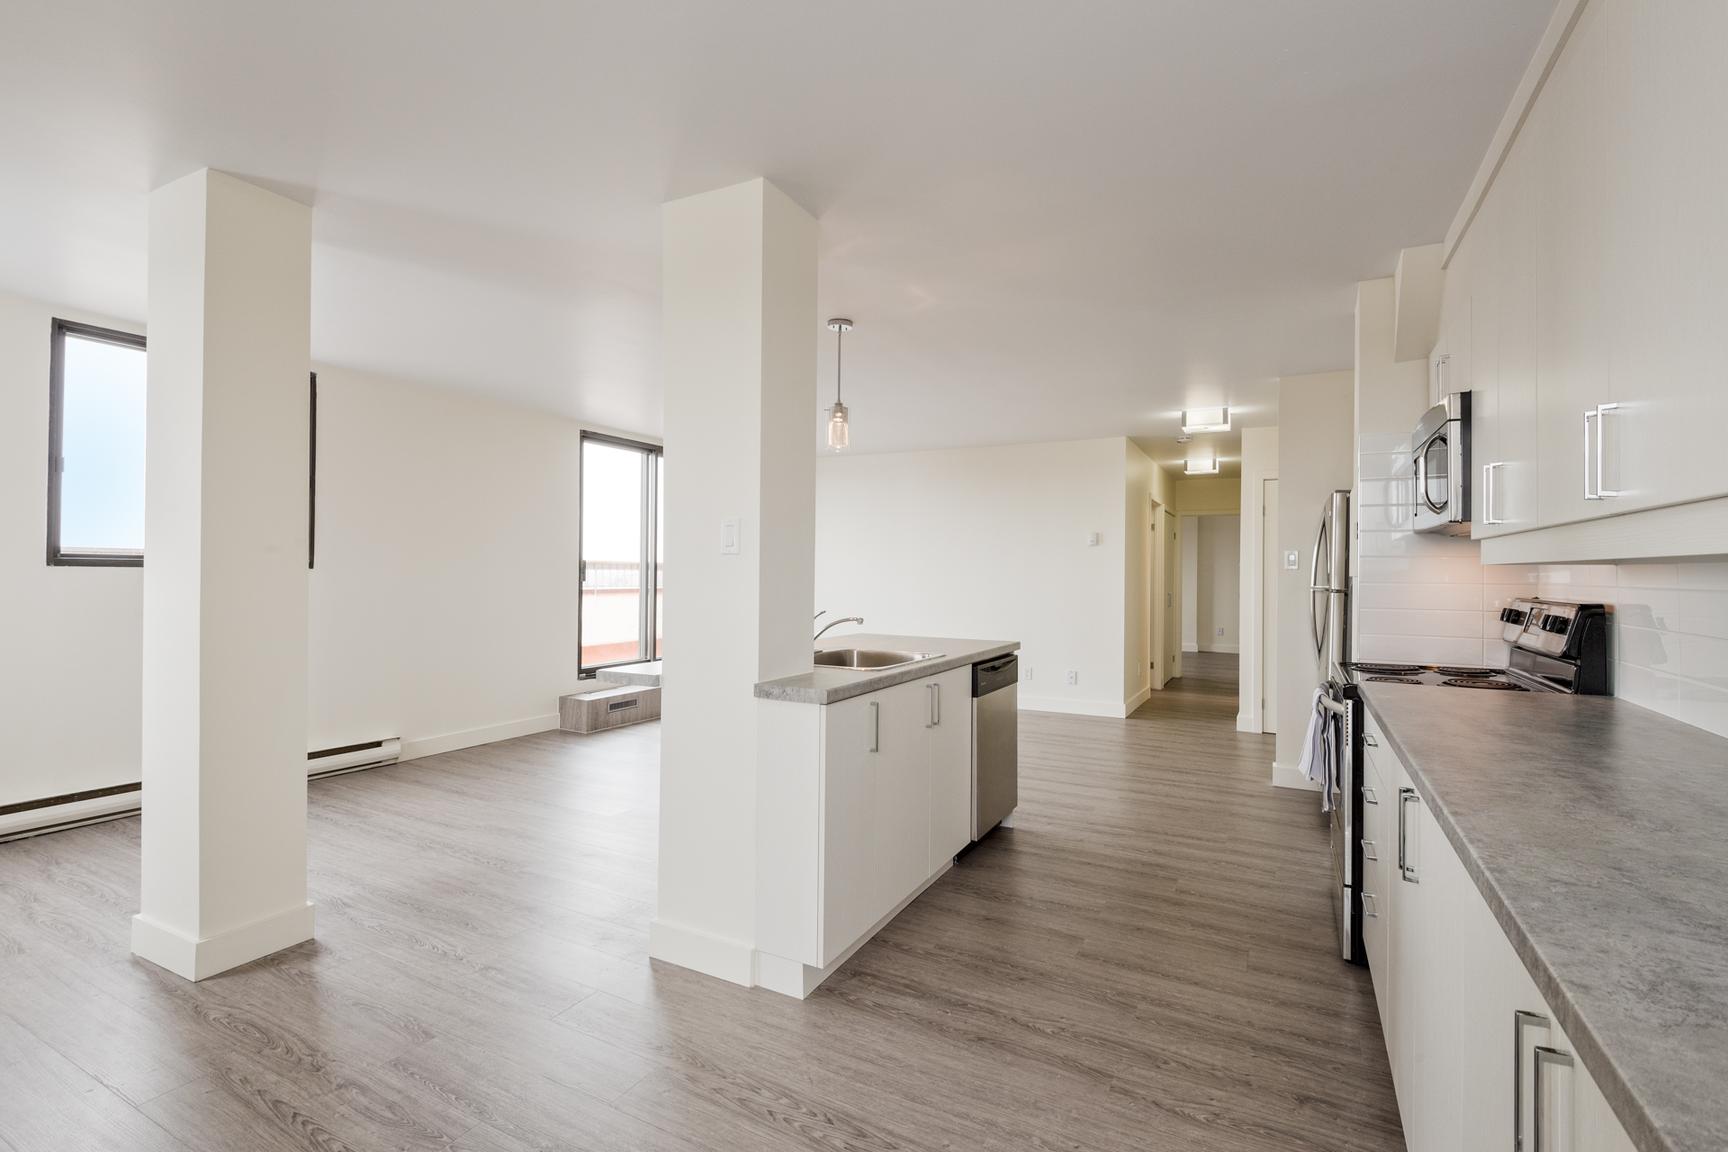 1 bedroom Apartments for rent in Laval at Le Quatre Cent - Photo 15 - RentQuebecApartments – L407183